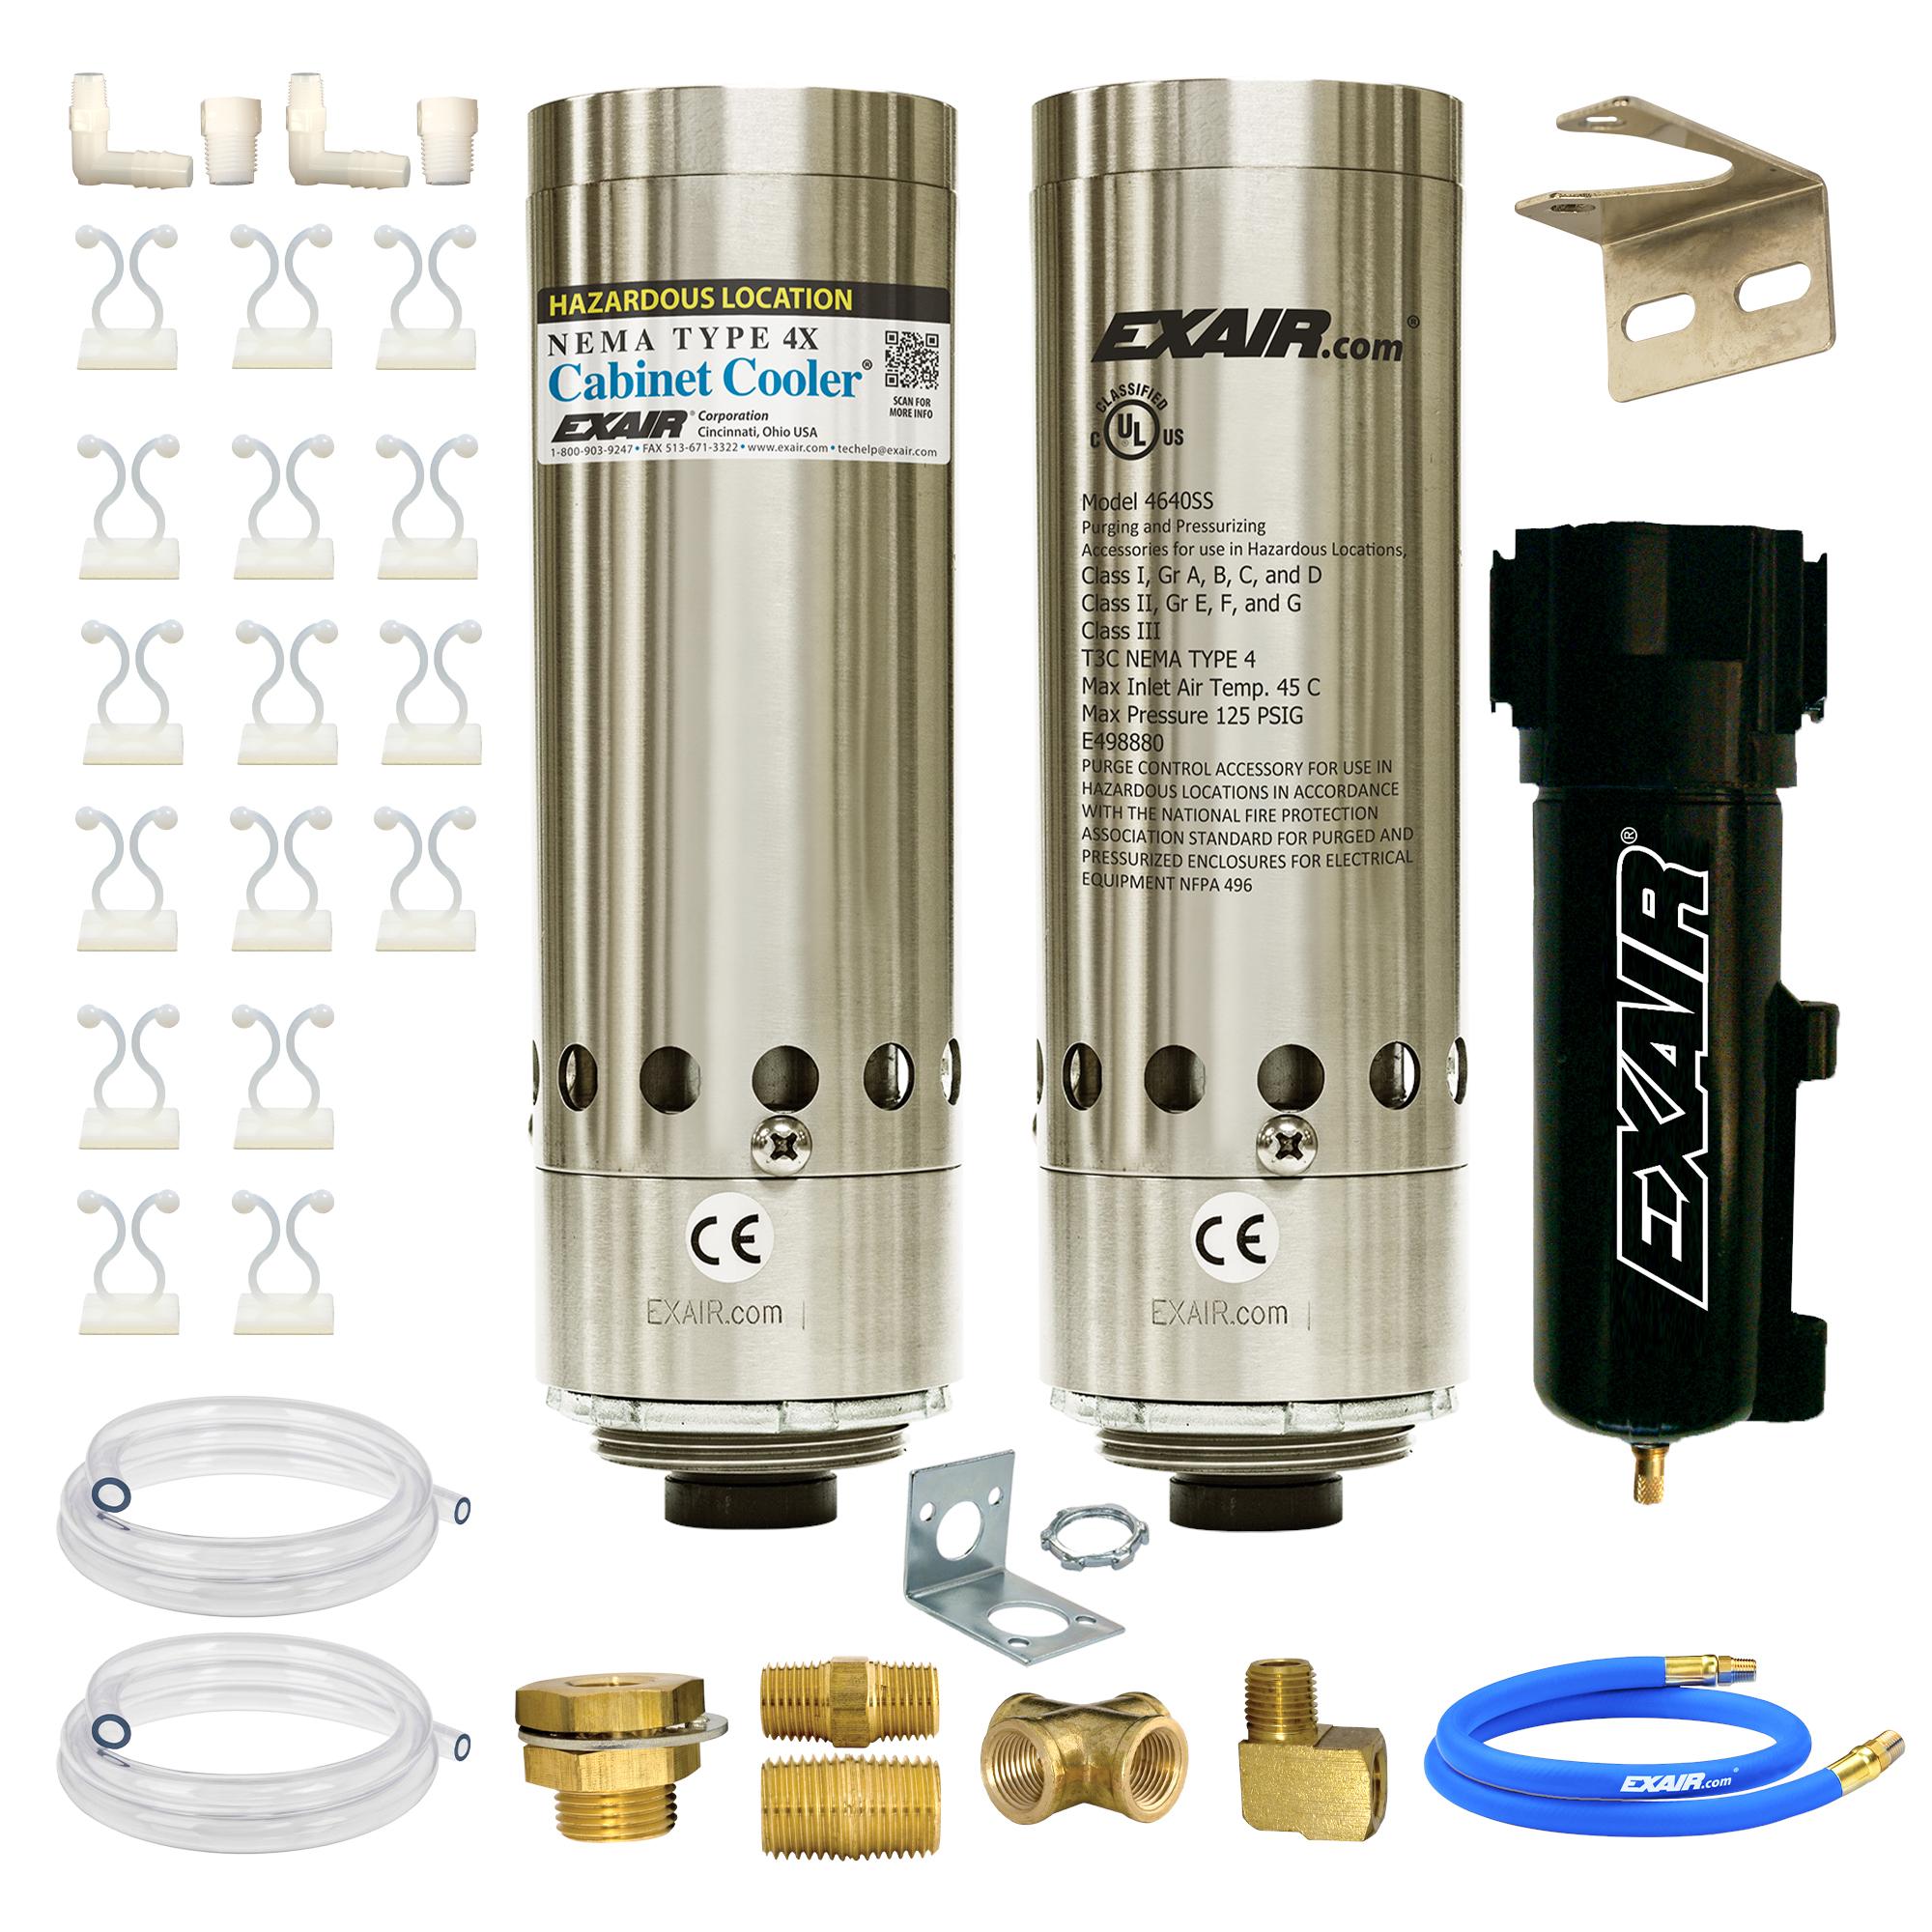 Model HZ4850 NEMA 4 3,400 Btu/hr HazLoc Cabinet Cooler w Therm